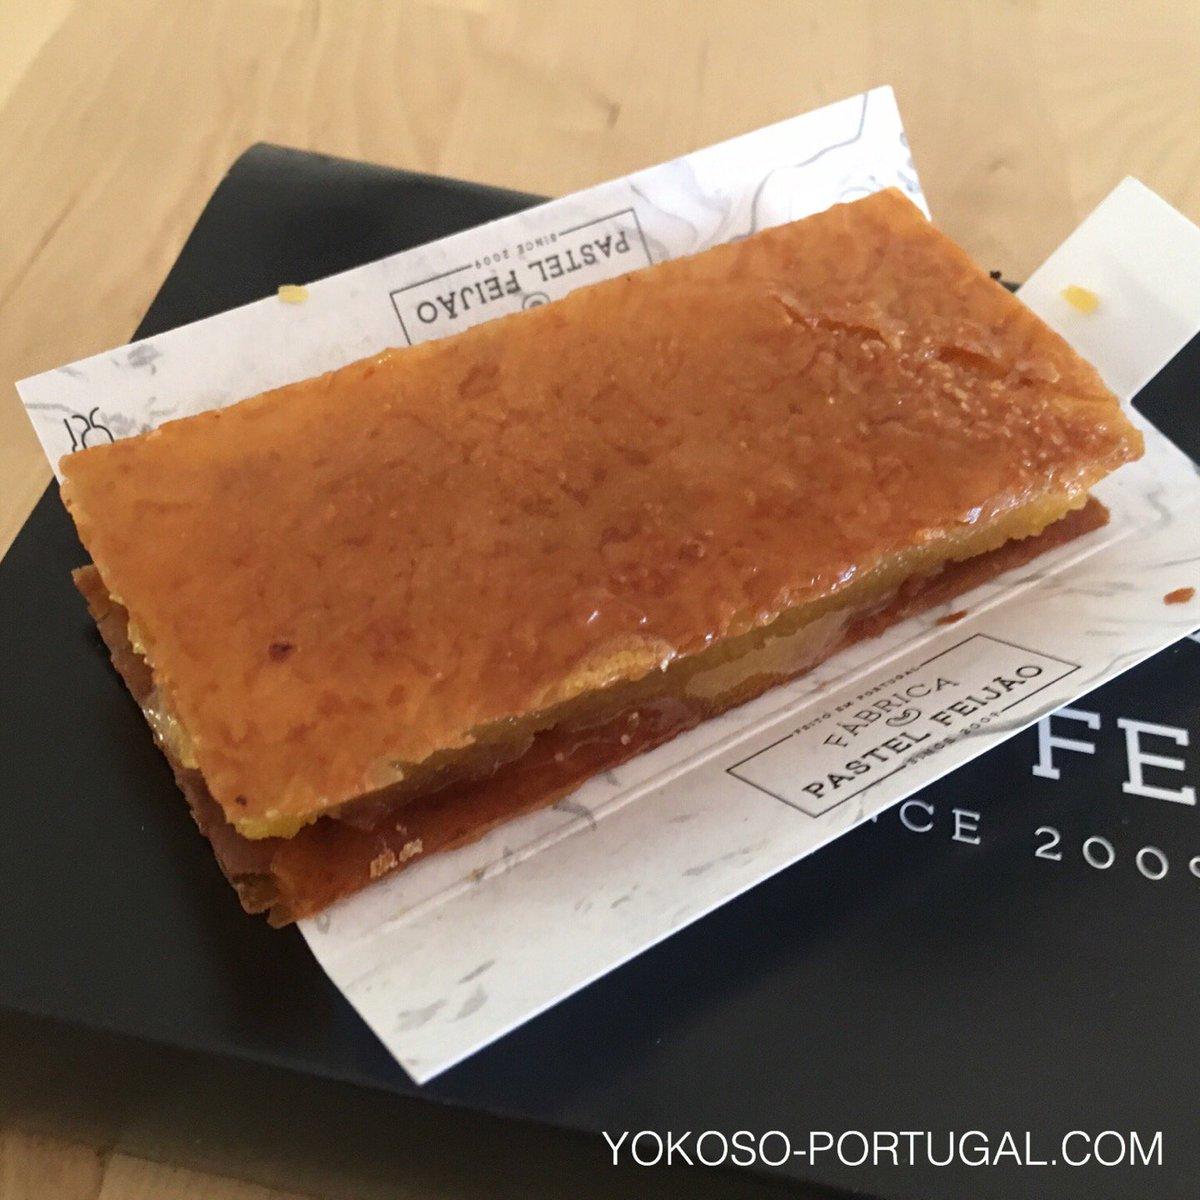 test ツイッターメディア - リスボンのアルファマ地区にあるパステラリア。和菓子みたいなインゲン豆のスイーツがおすすめです。 (@ Fábrico Do Pastel Feijão in Lisbon) https://t.co/GsfeDhAFom https://t.co/oGCuusMVP9